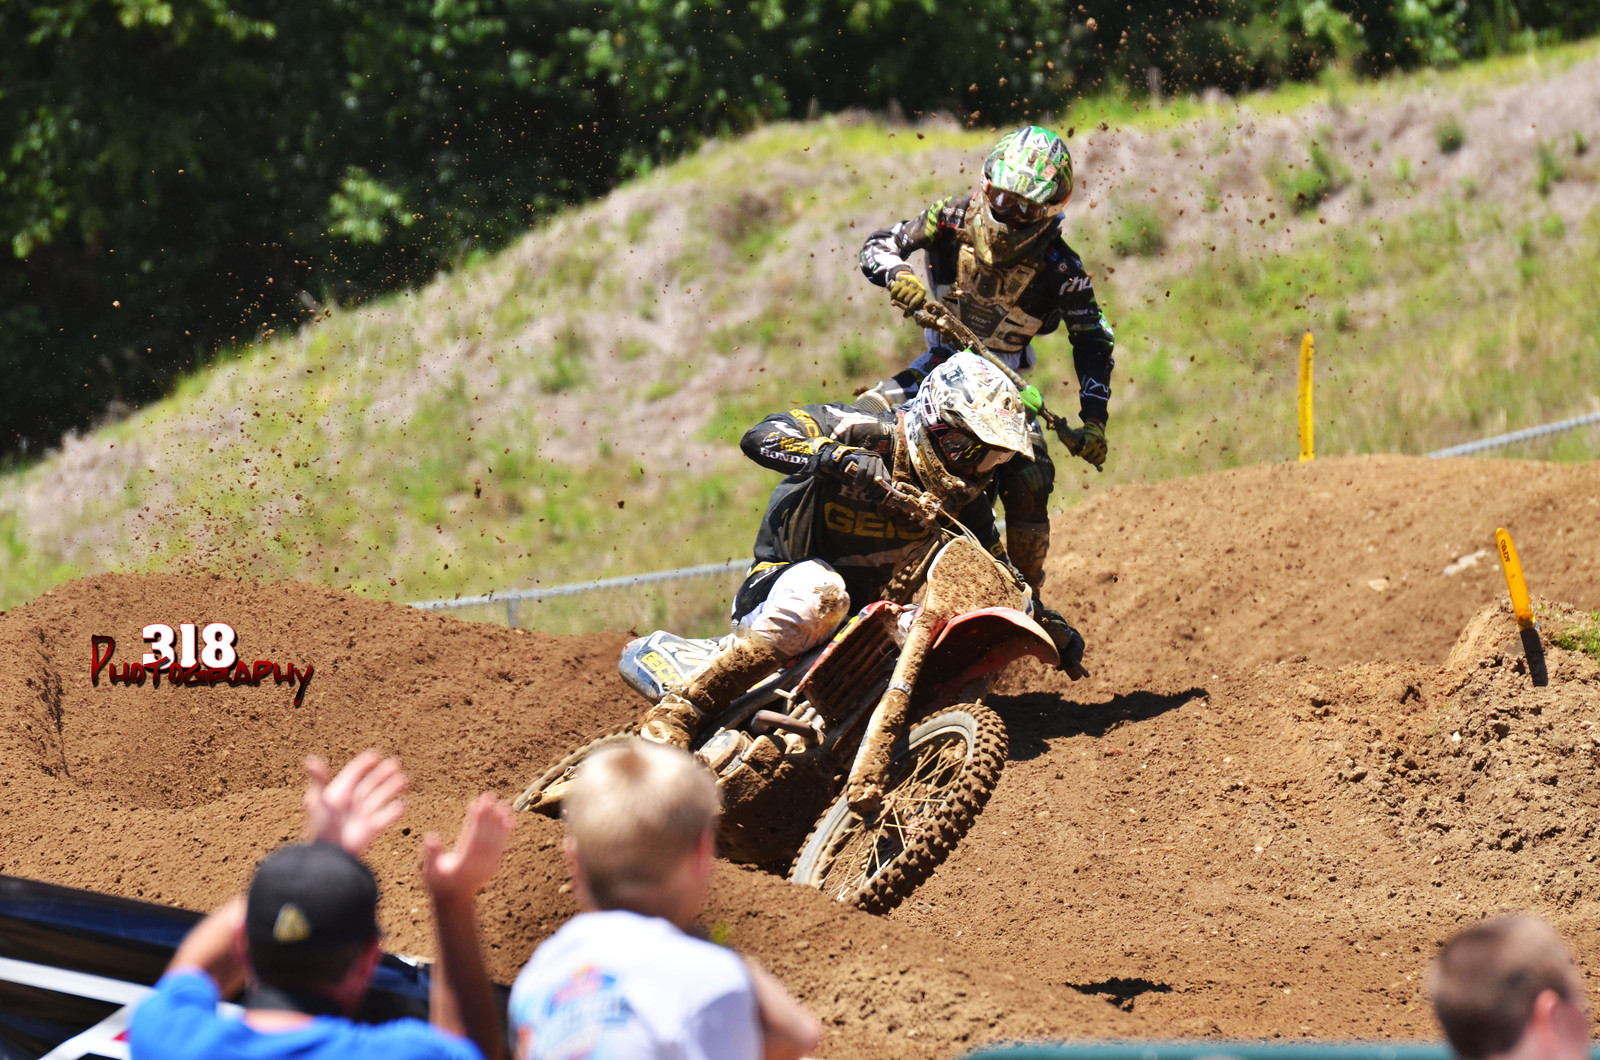 20-12-01 - MxPro318 - Motocross Pictures - Vital MX